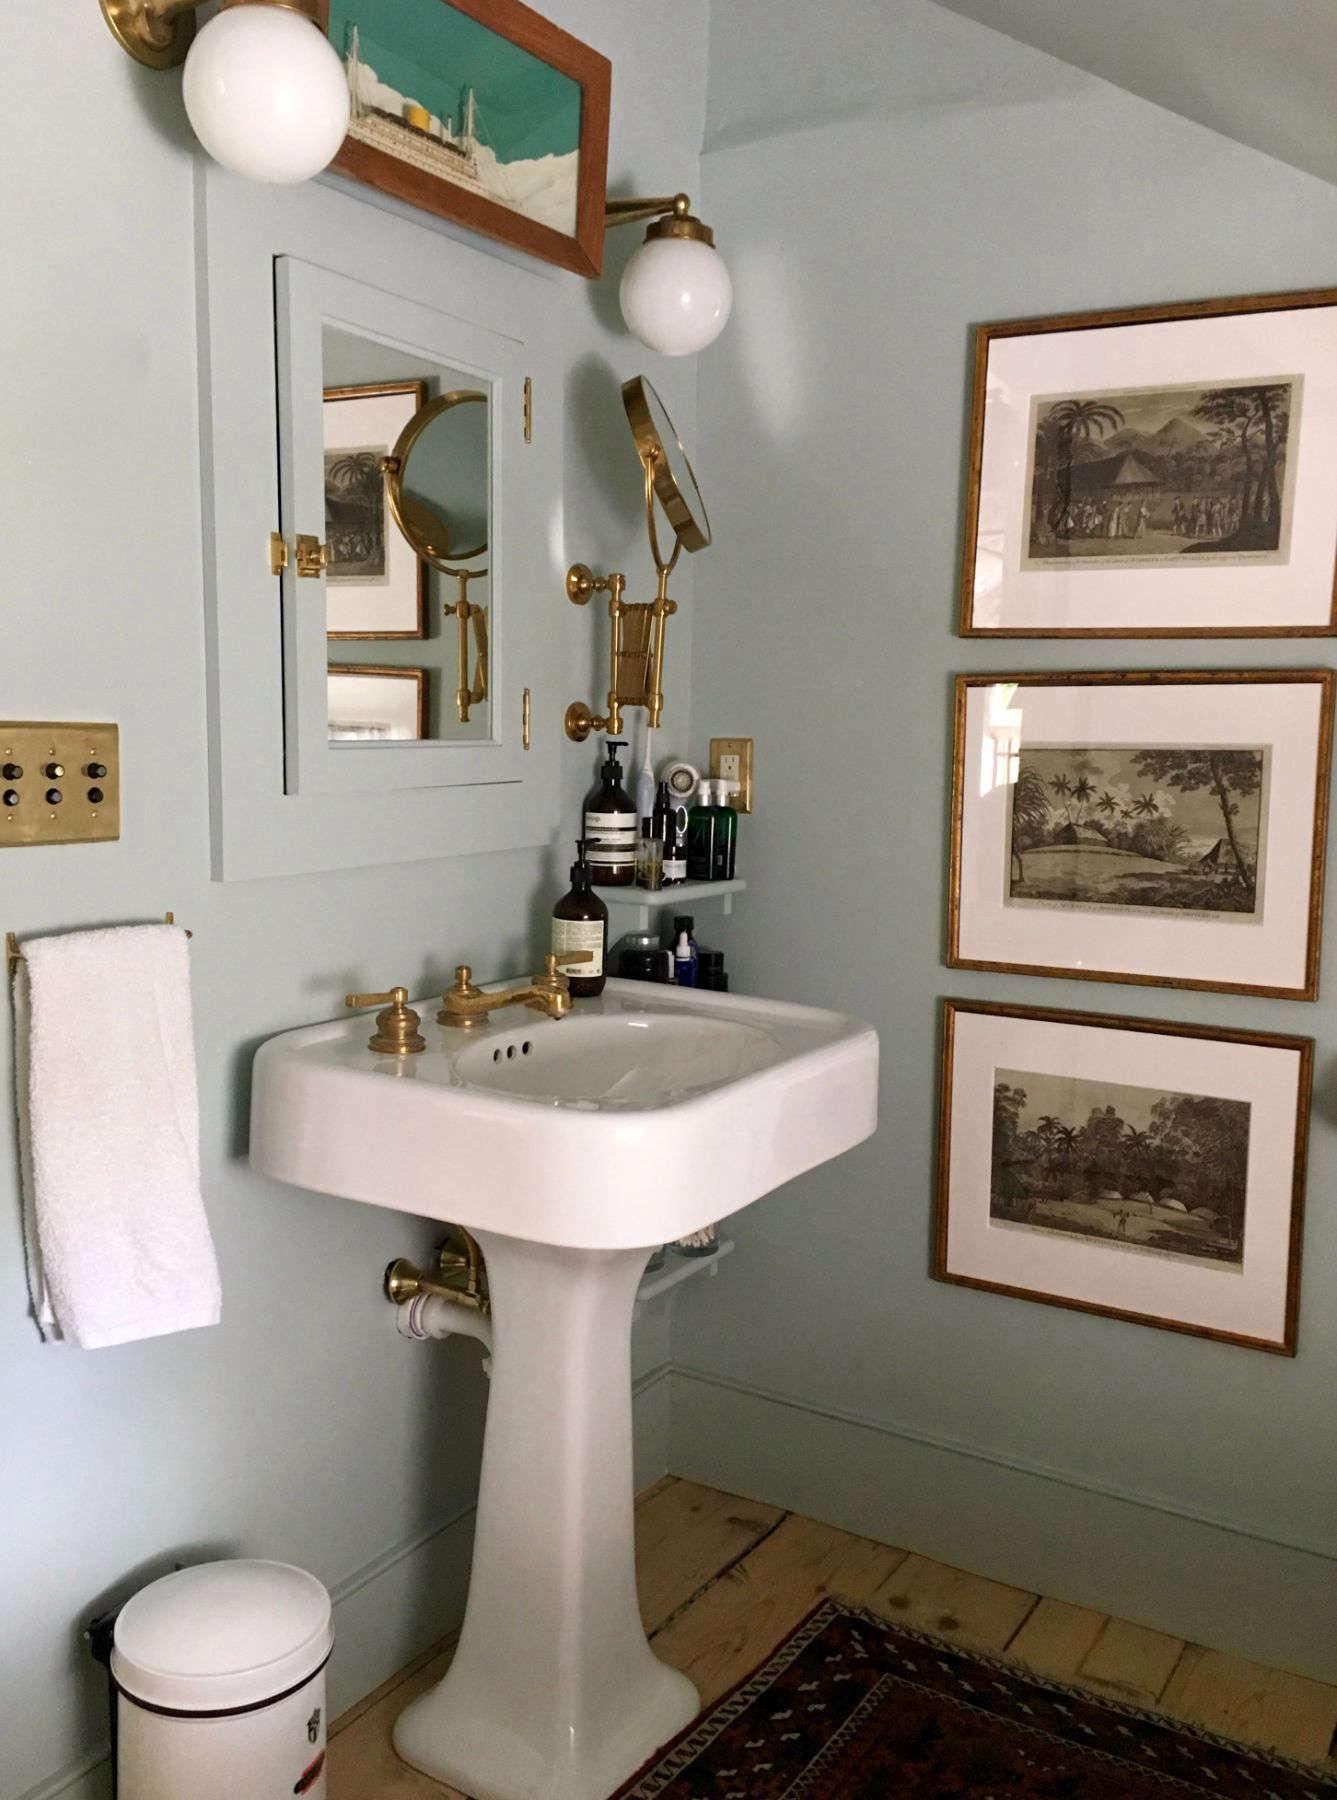 Hudson Valley Farmhouse Bathroom Remodel - Remodelista on Farmhouse Bathroom Remodel Ideas  id=19303